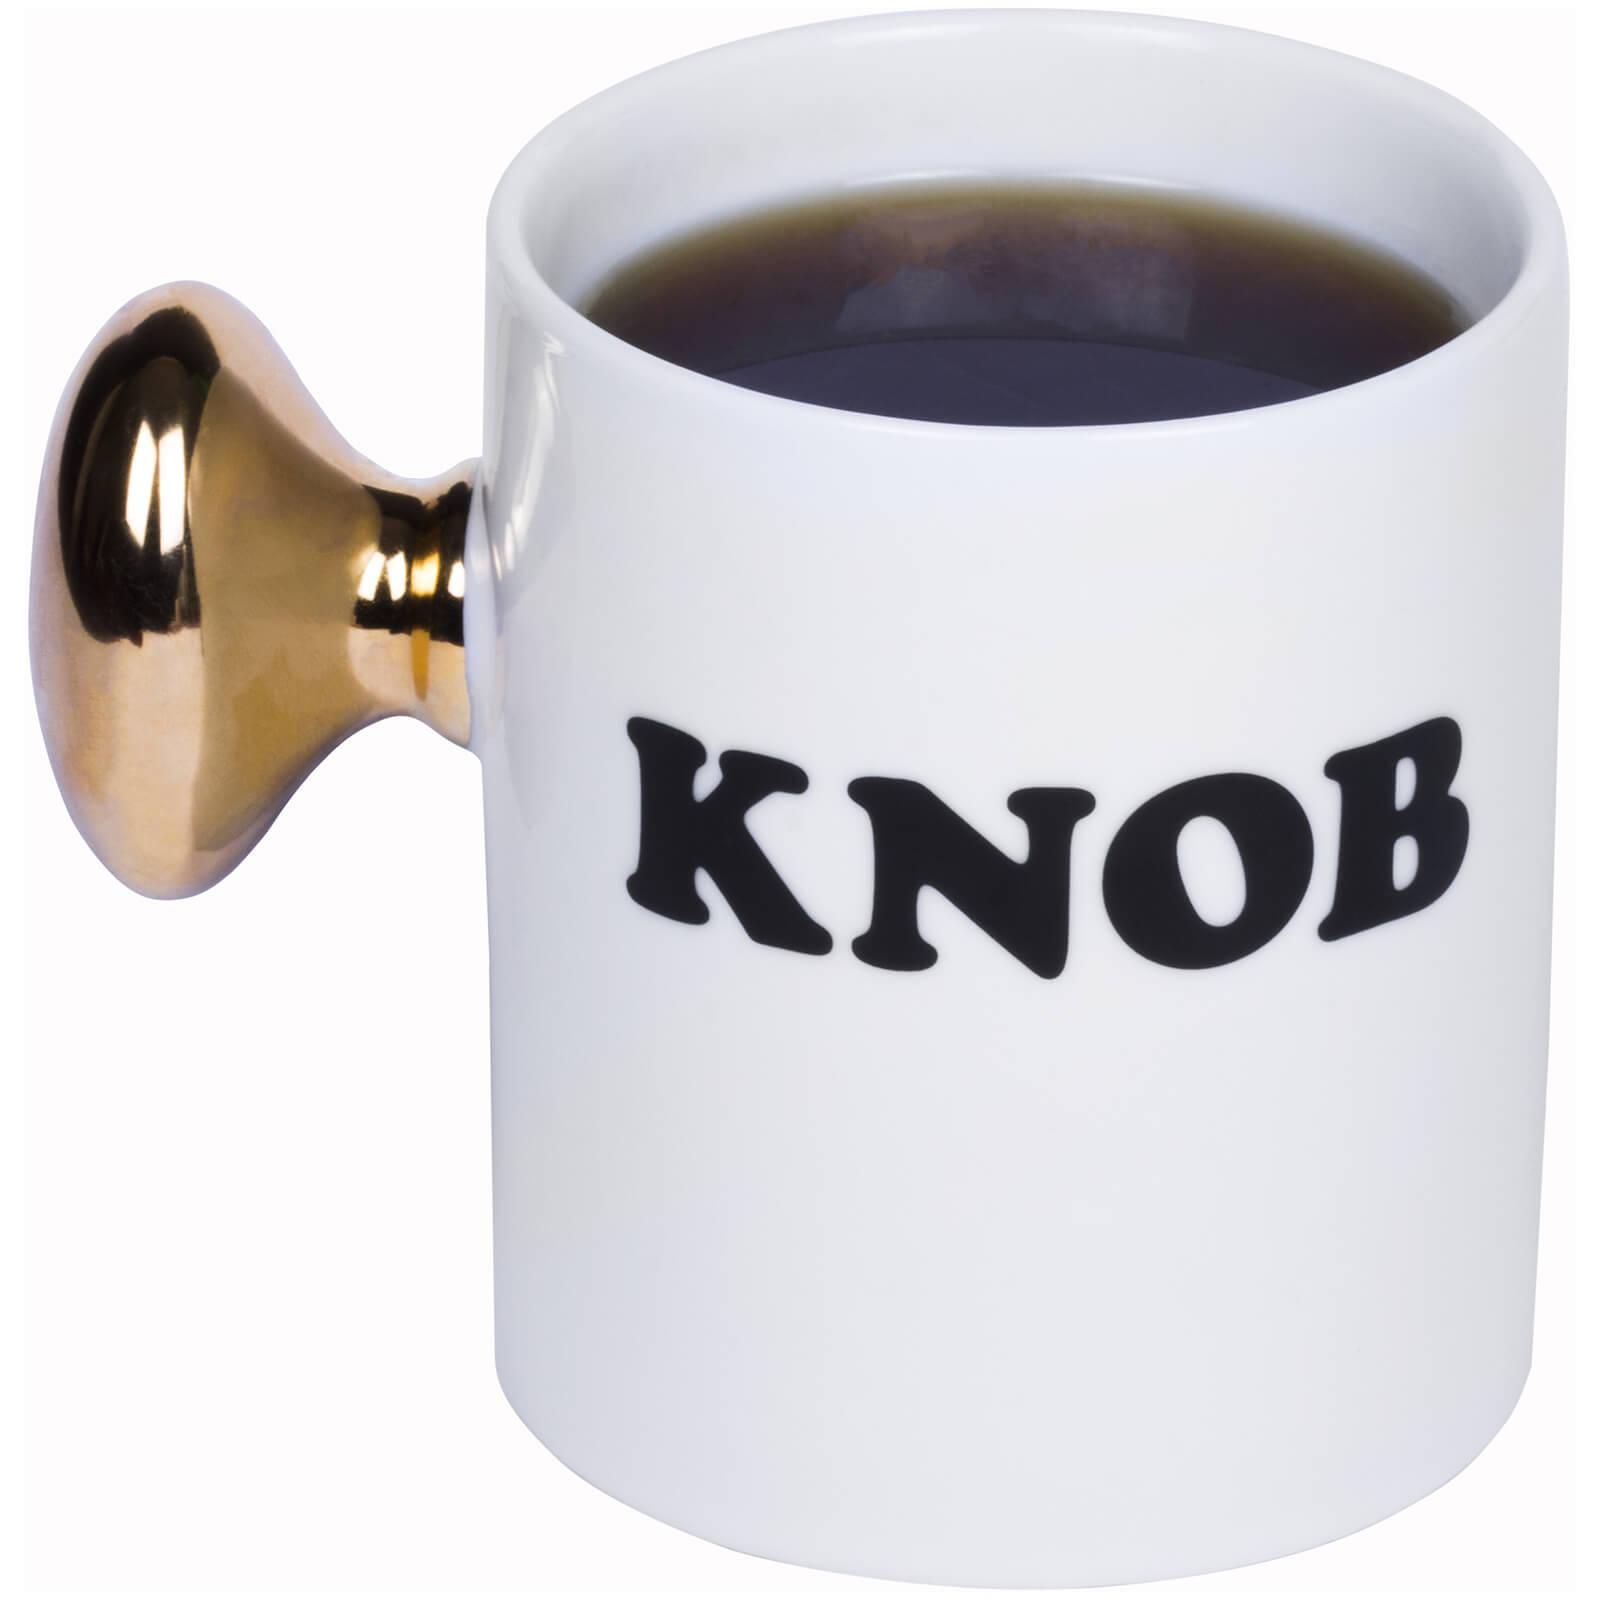 White Knob Mug with gold tinted door knob handle